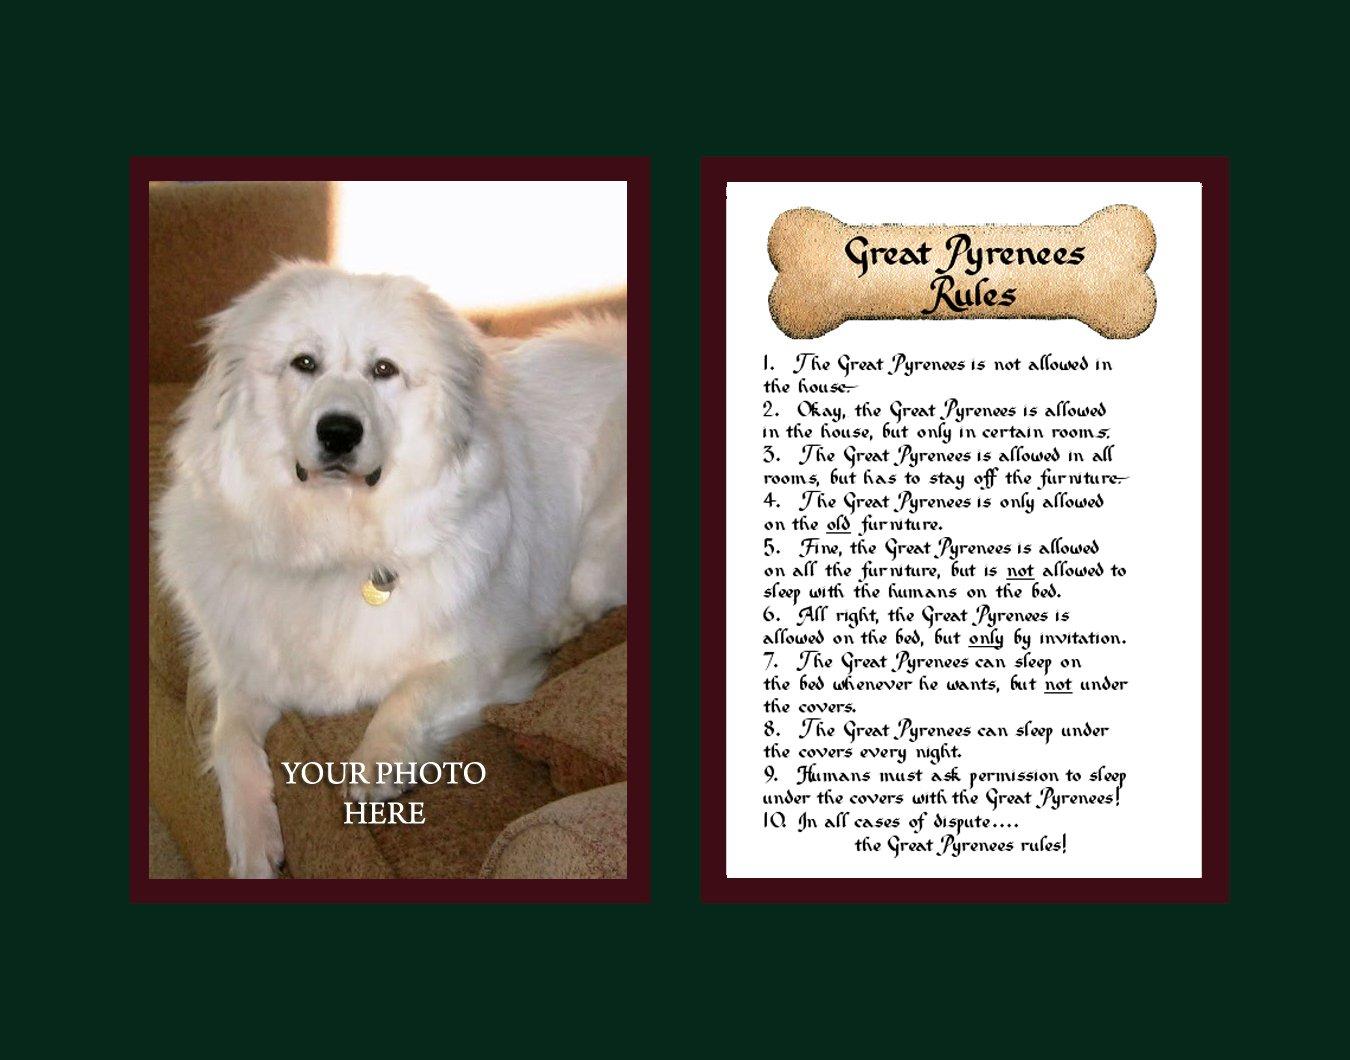 McDarlins Calligraphy Dog Rules Great Pyrenees Wall Decor Pet Dog Saying Gift 1